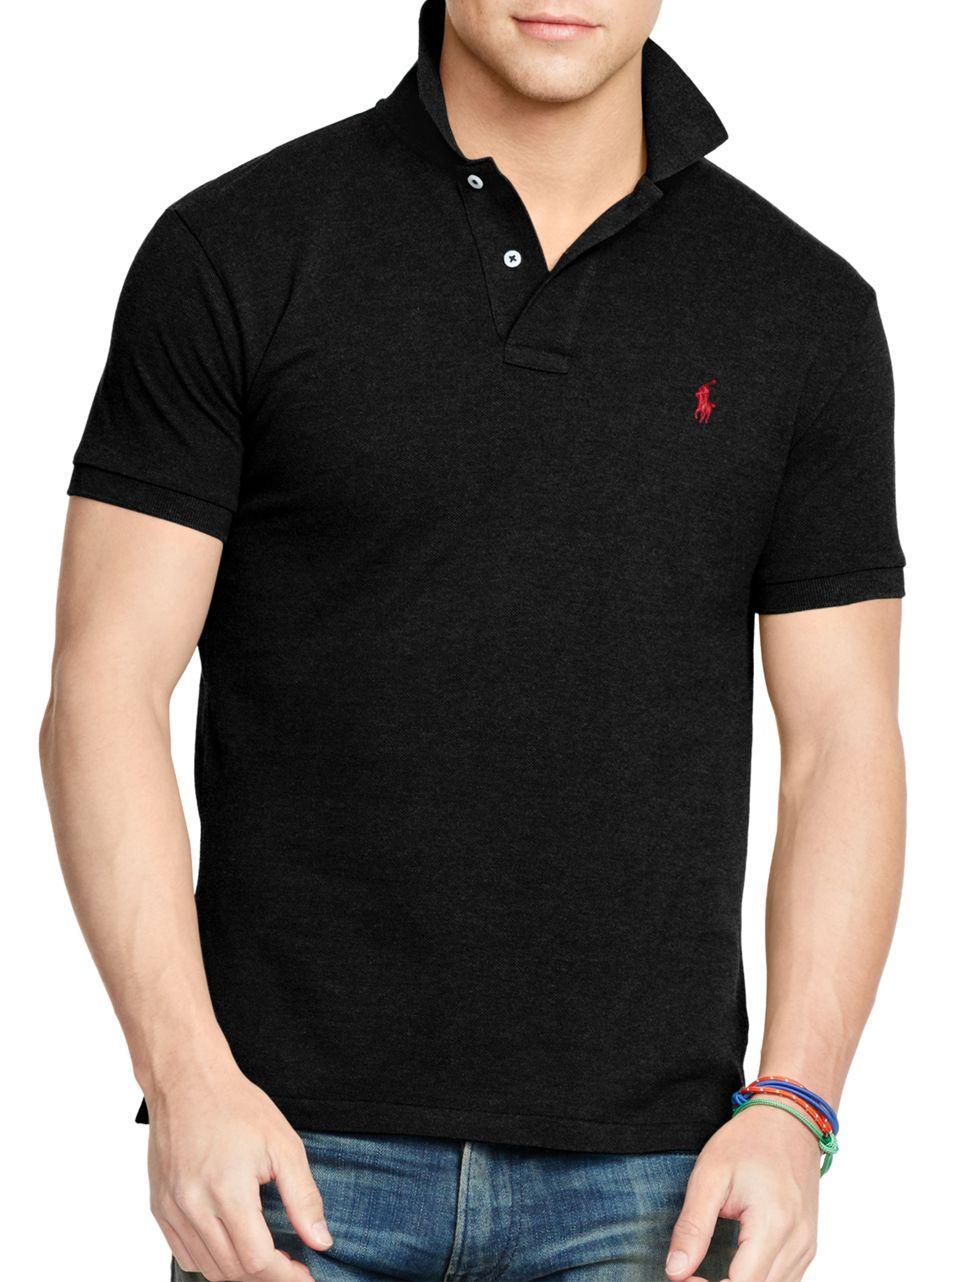 Polo Ralph Lauren Slim Fit Mesh Polo In Black For Men Lyst